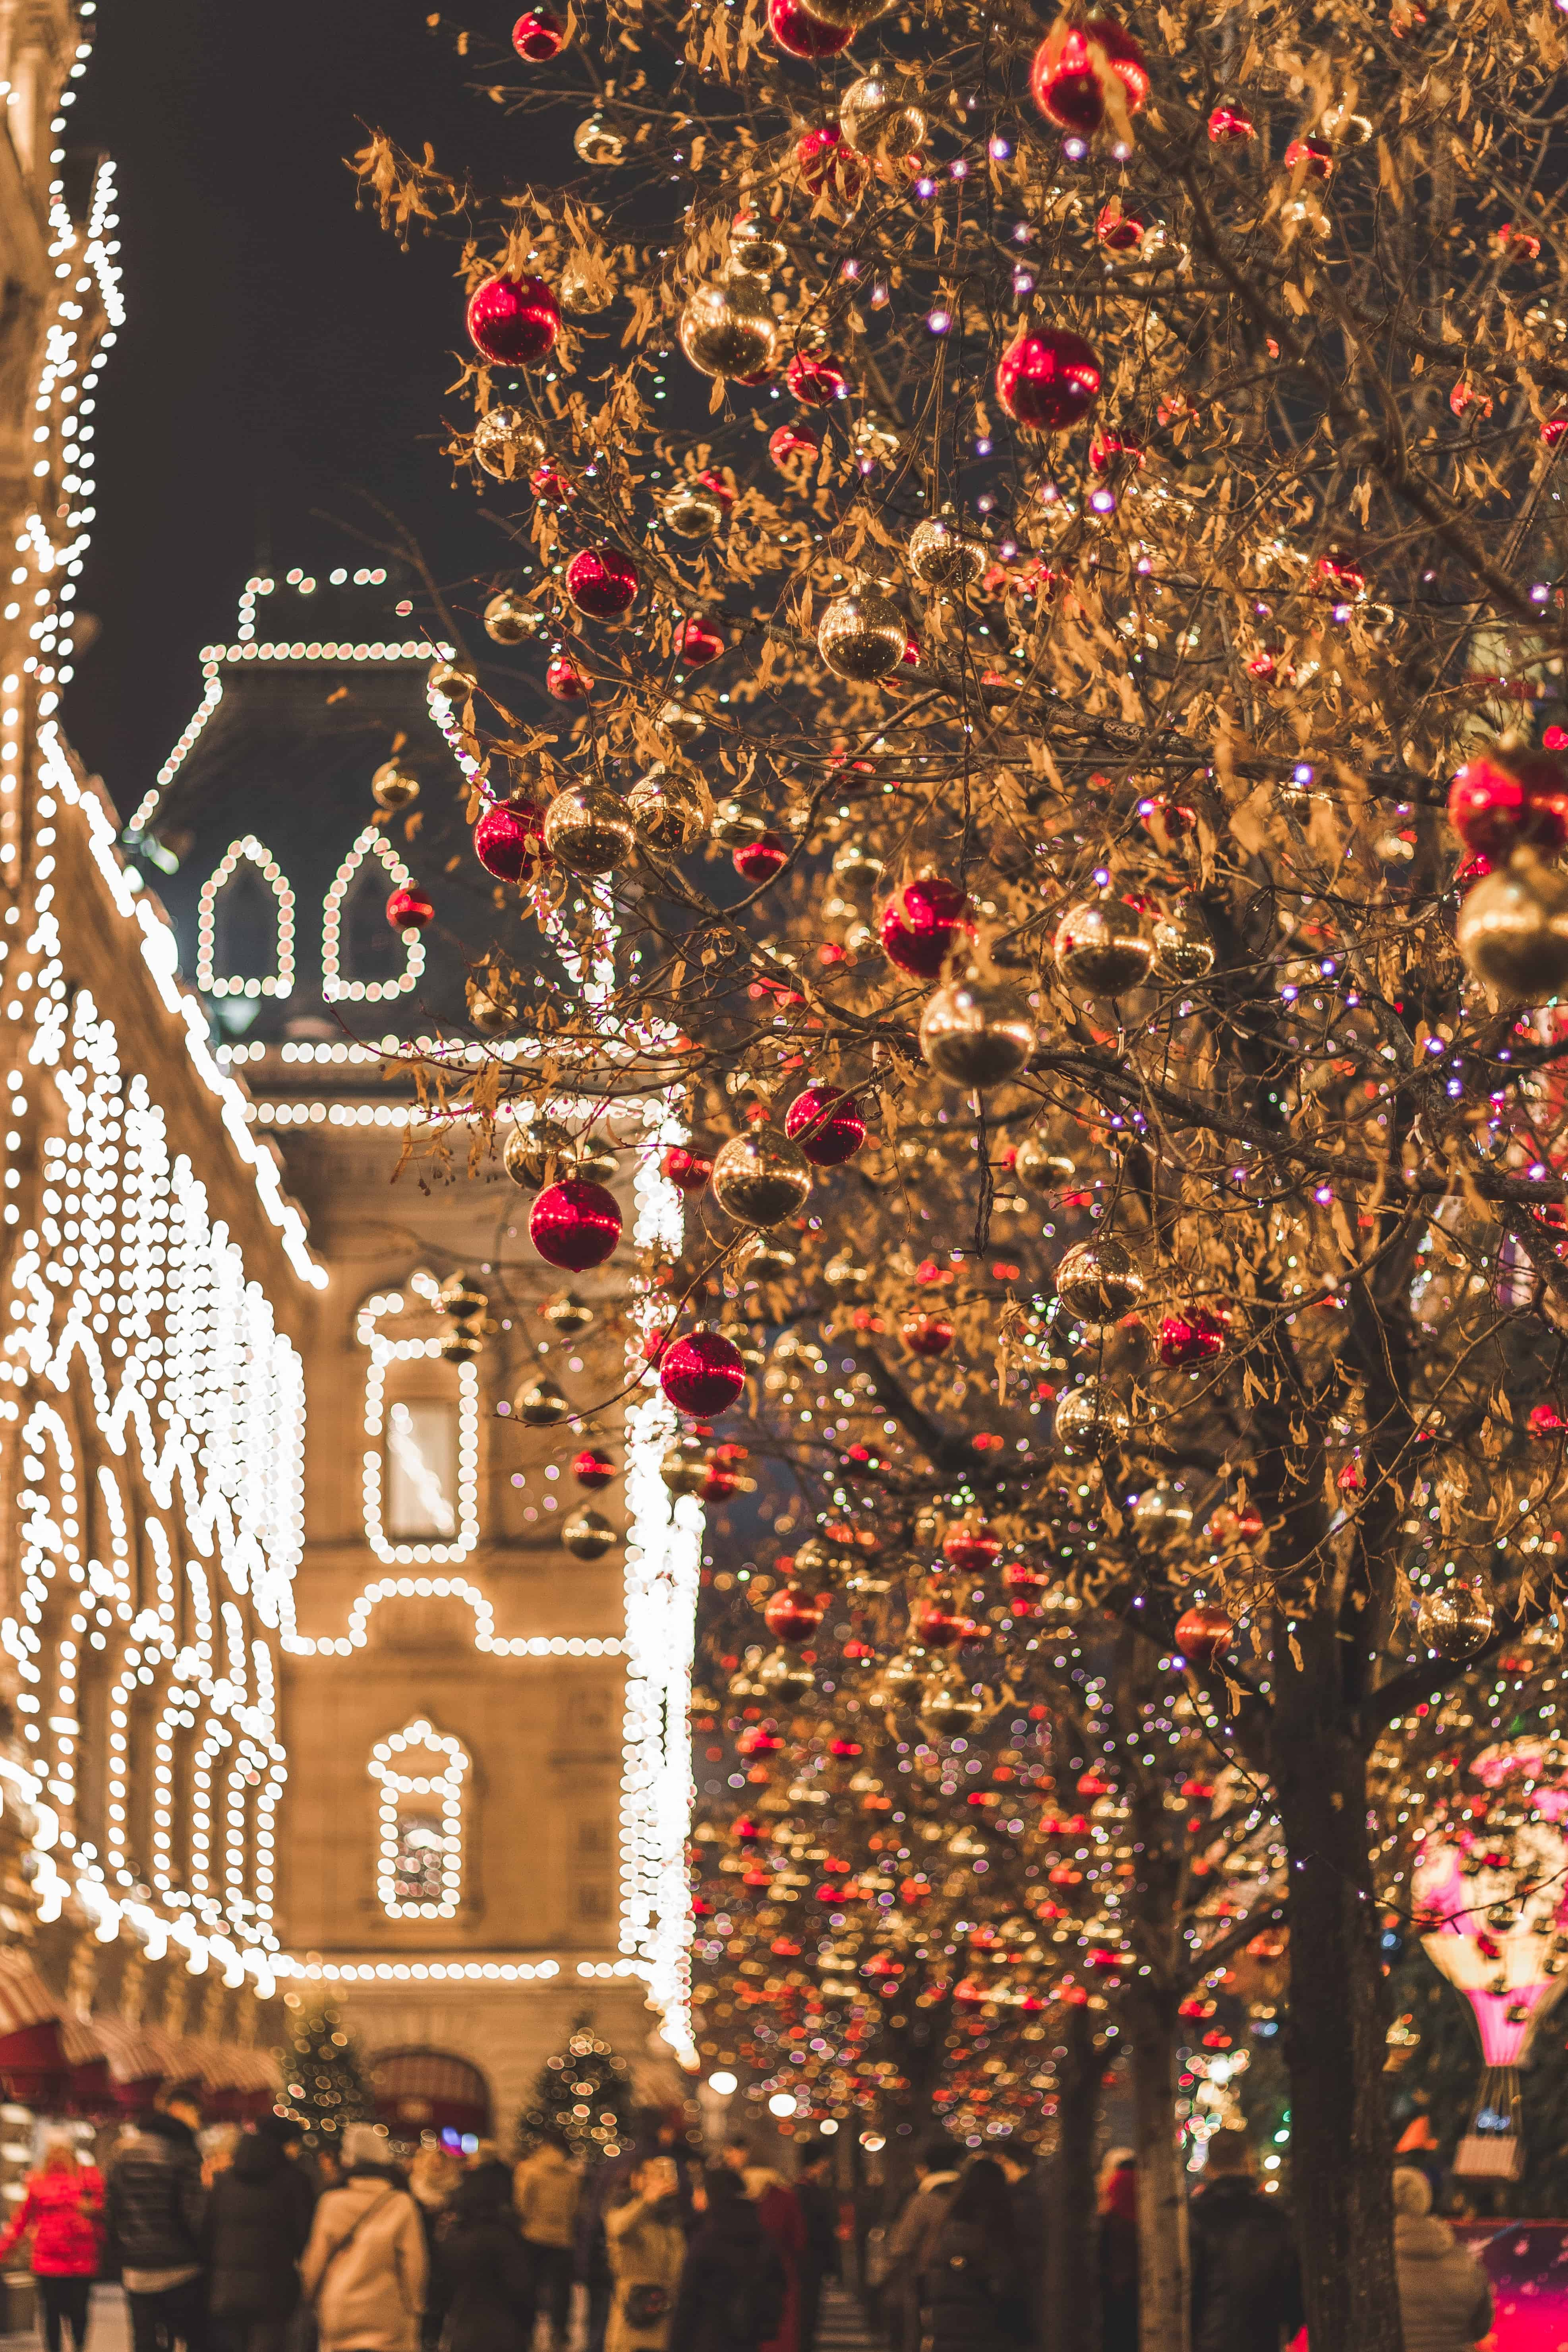 2019 Christmas Festivals To Add To Your Calendar